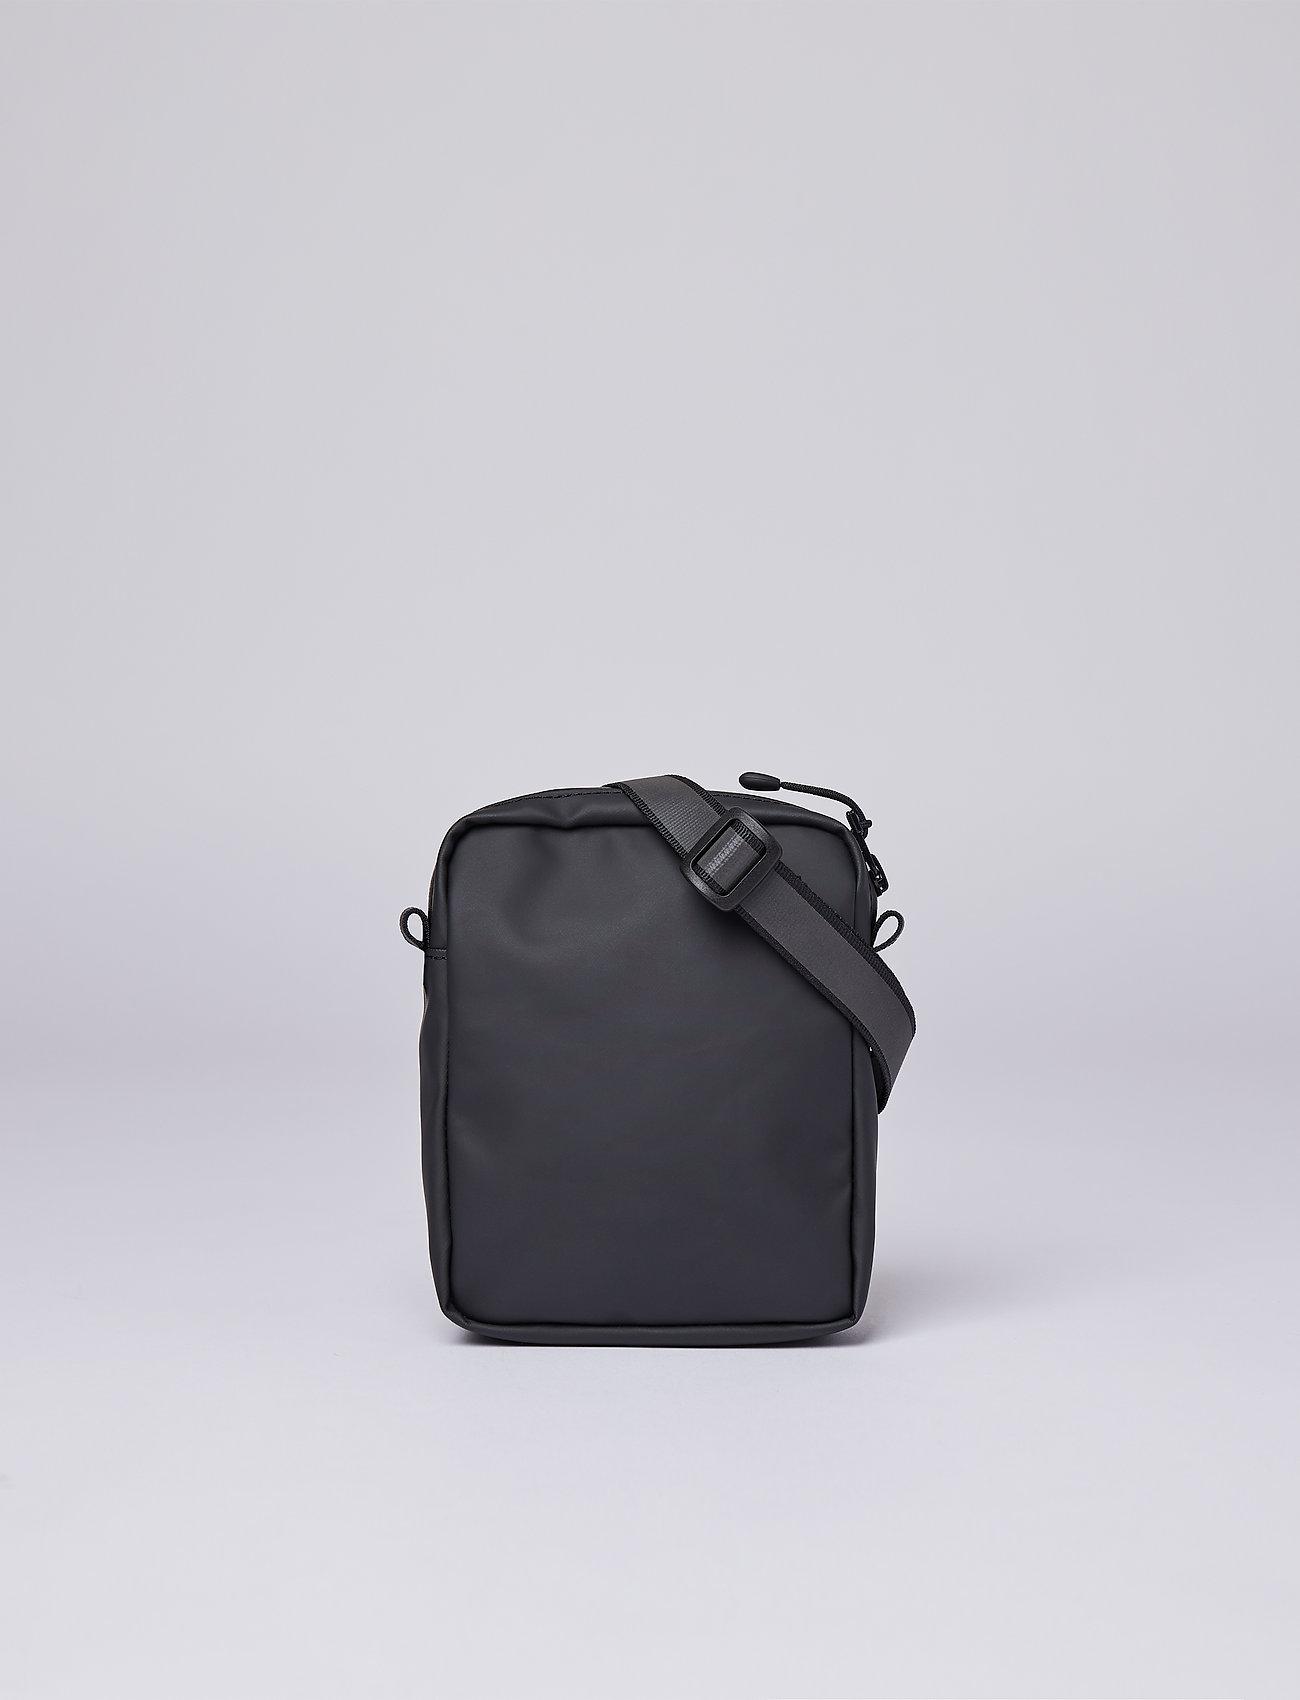 SANDQVIST - POE - tassen - black - 6